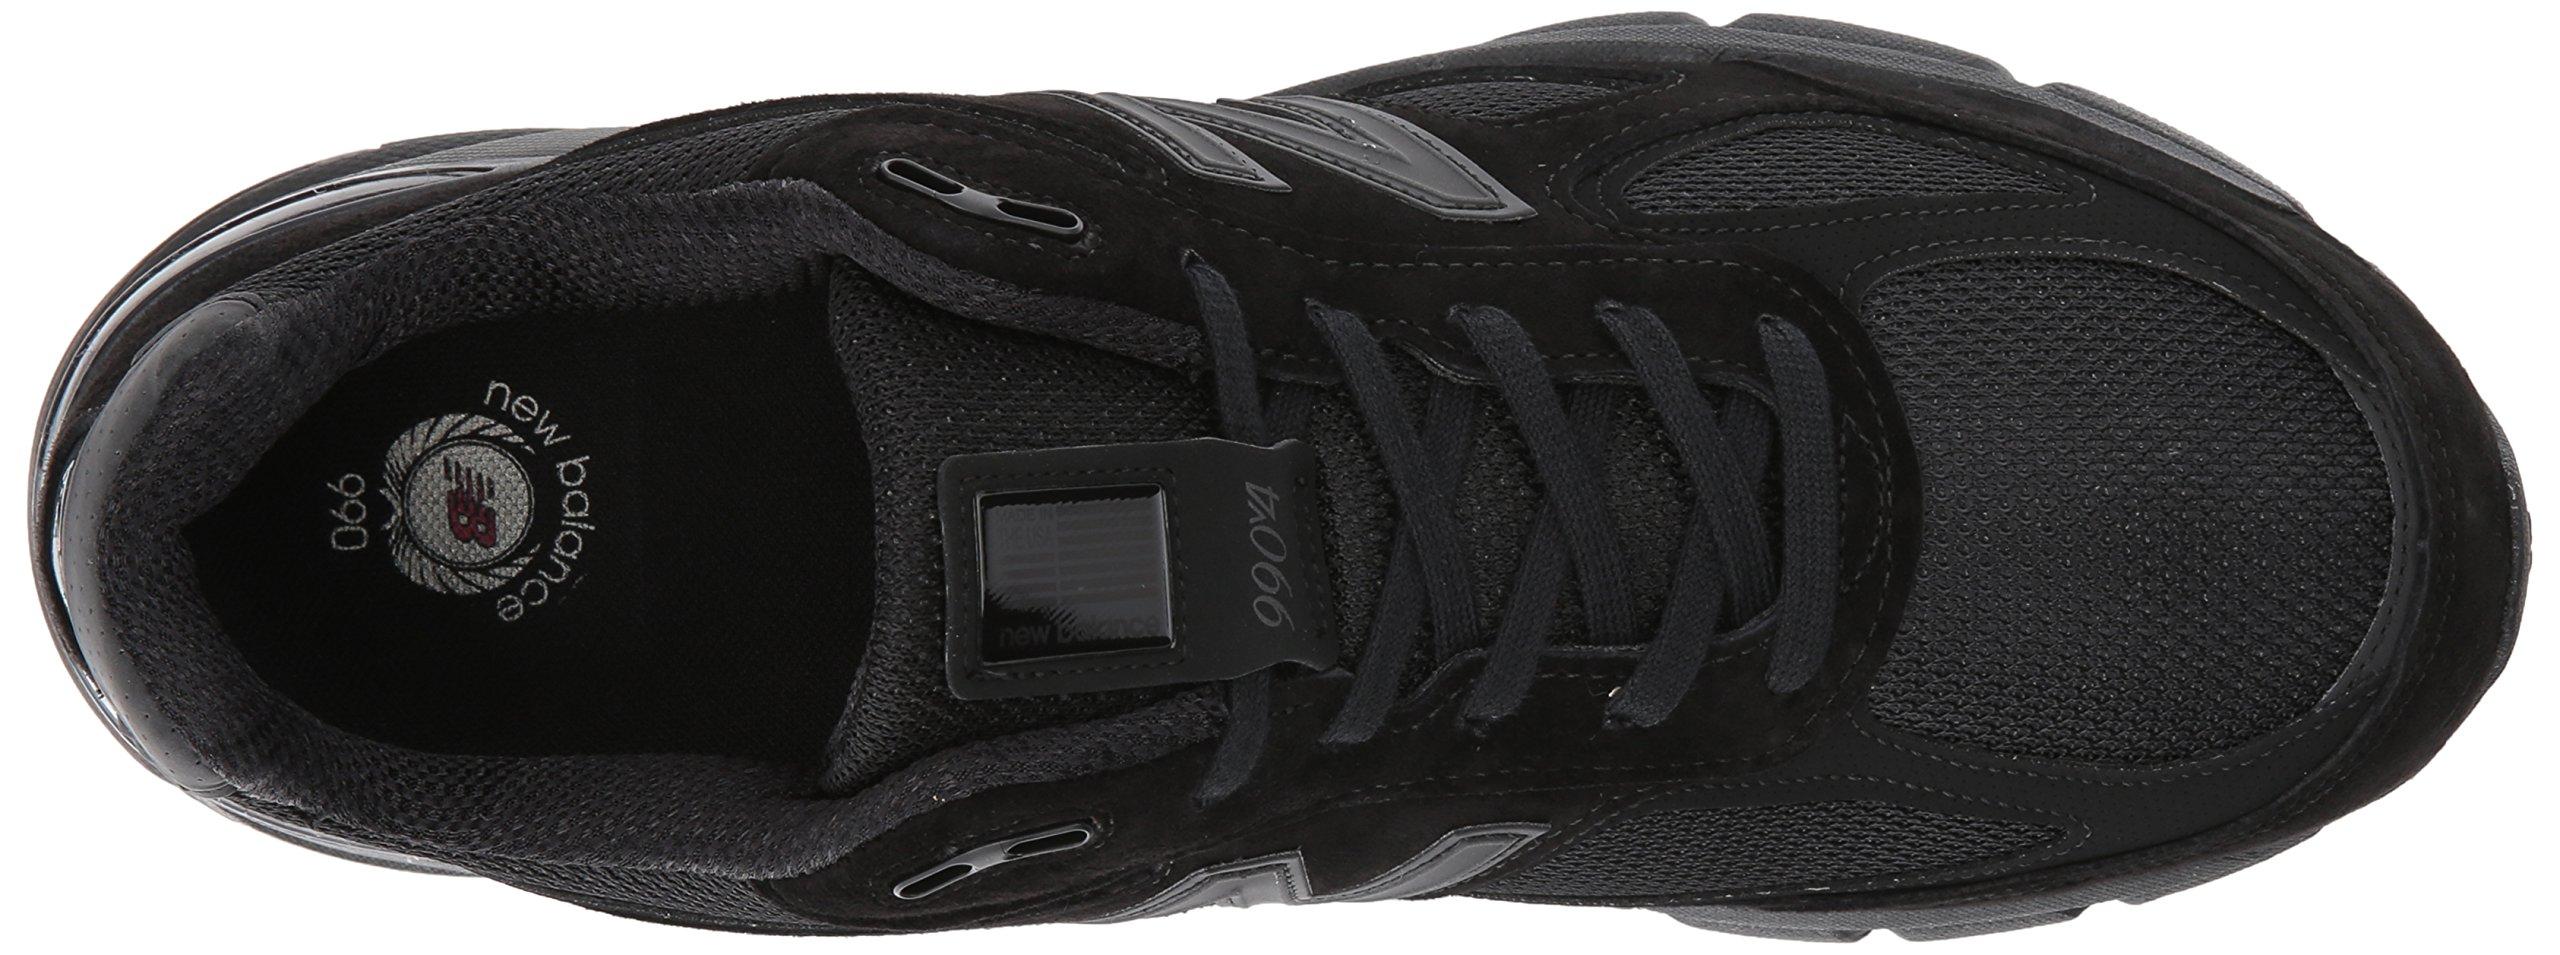 New Balance Men's 990V4 Running Shoe, Black/Black, 11 2E US by New Balance (Image #8)